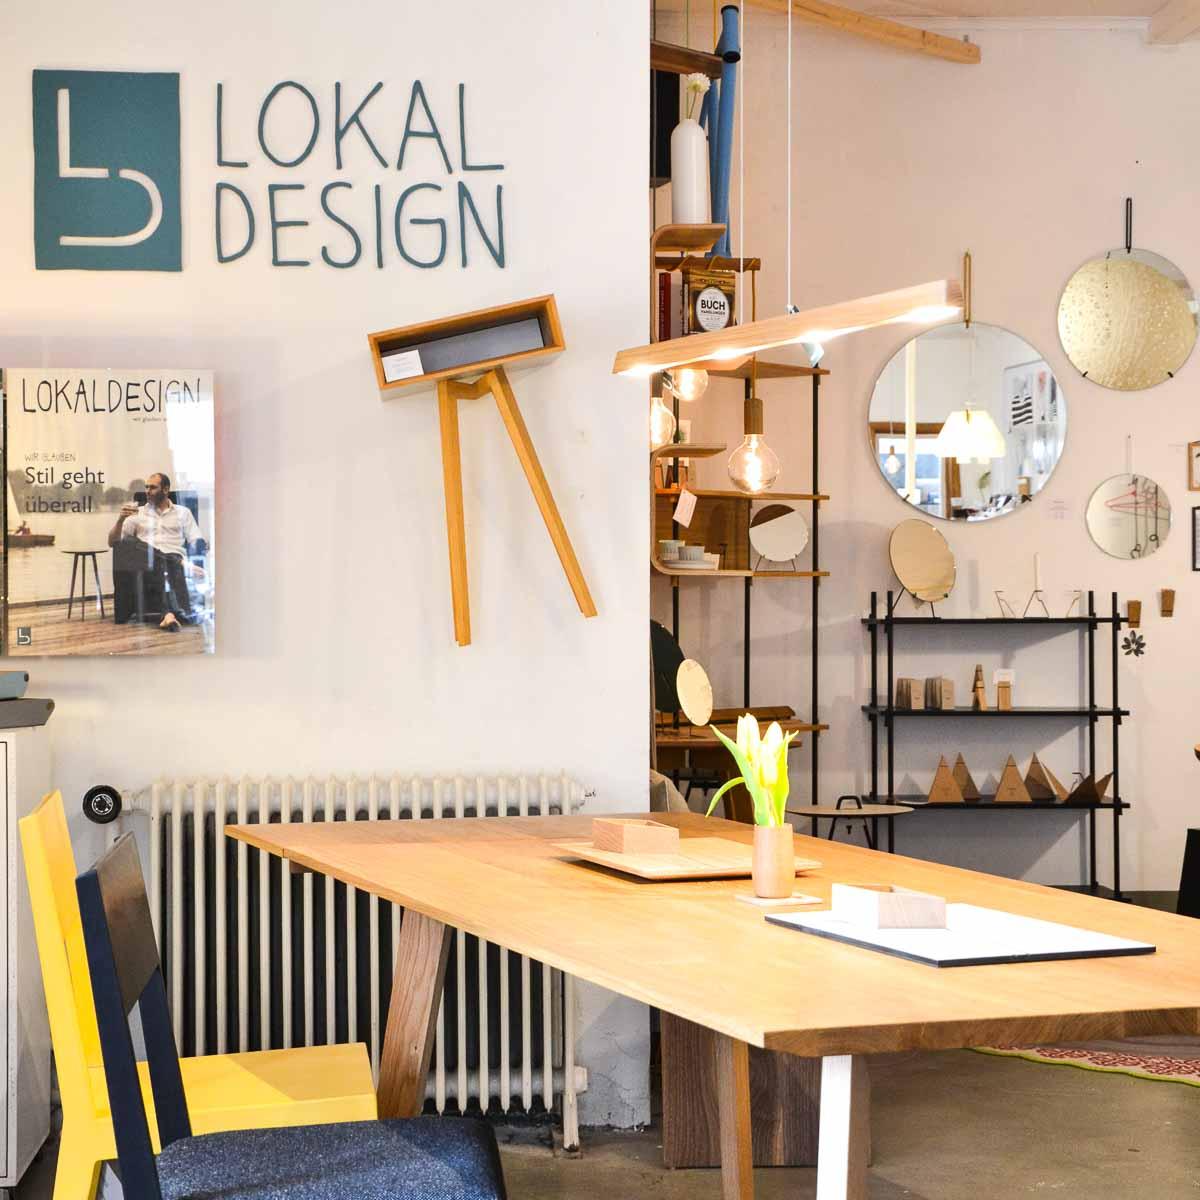 Concept Store Lokaldesign in Hamburg